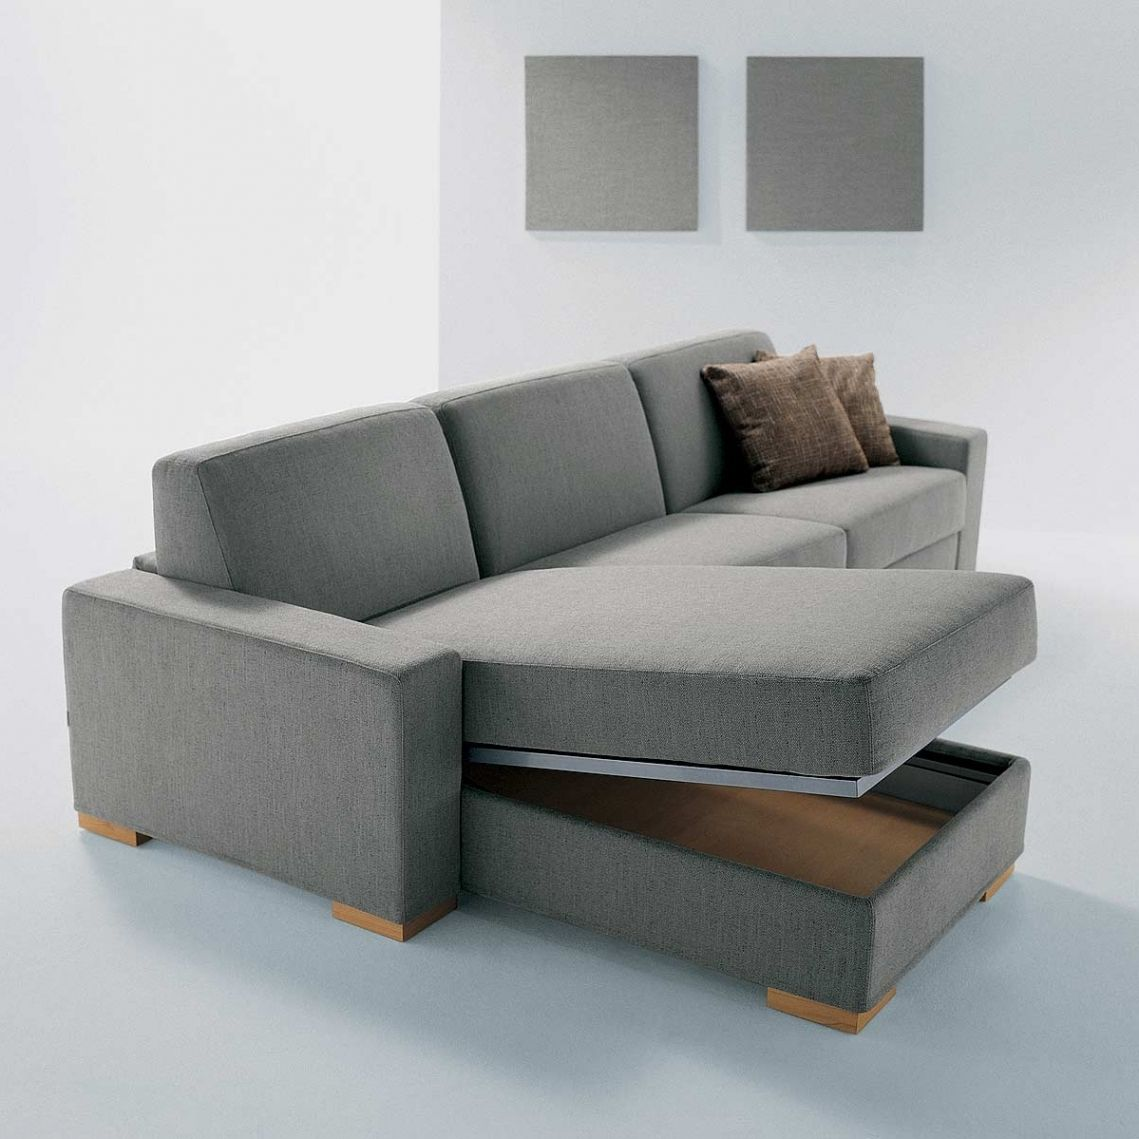 The best and elegant sofa sleeper design for your home elegant